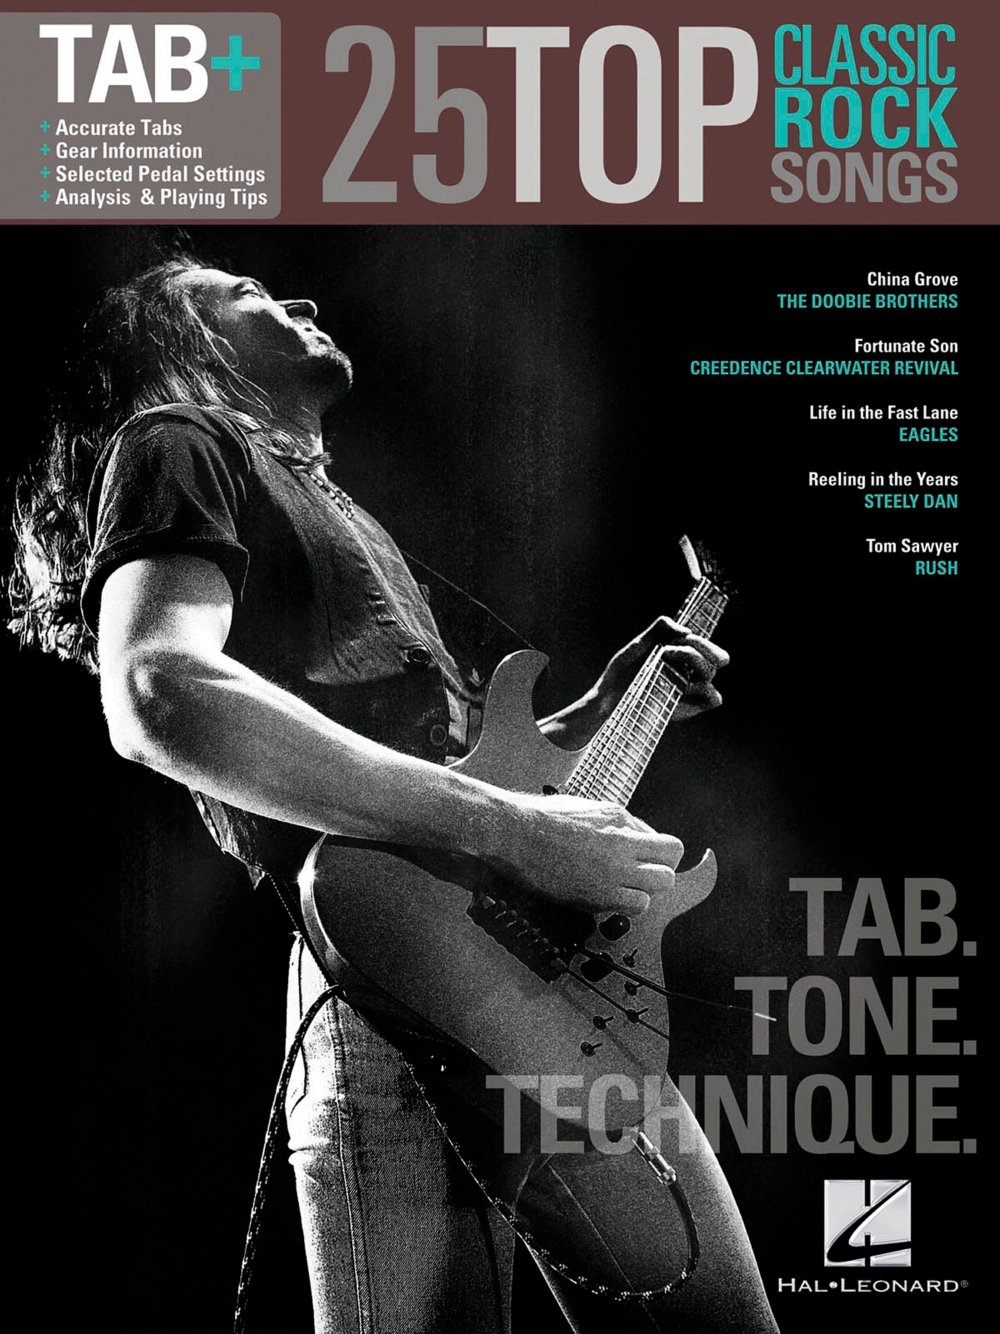 Read Online Hal Leonard 25 Top Classic Rock Songs from Guitar Tab + Songbook Series - Tab, Tone & Technique pdf epub